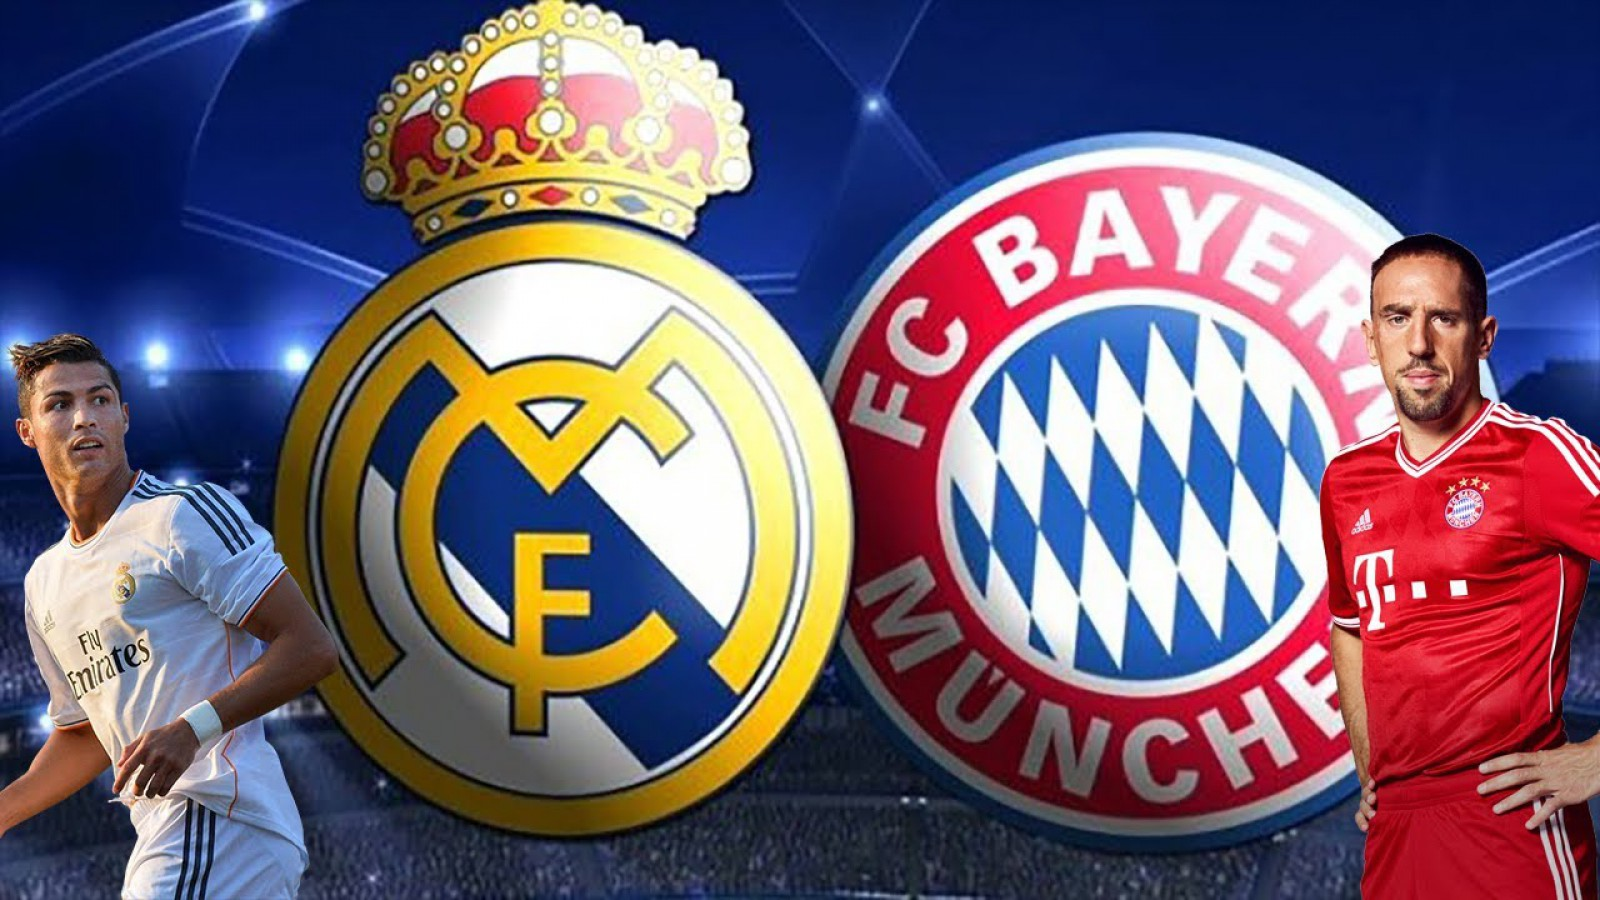 Pronostic la Real Madrid v Bayern Munchen. Vezi cine se califică